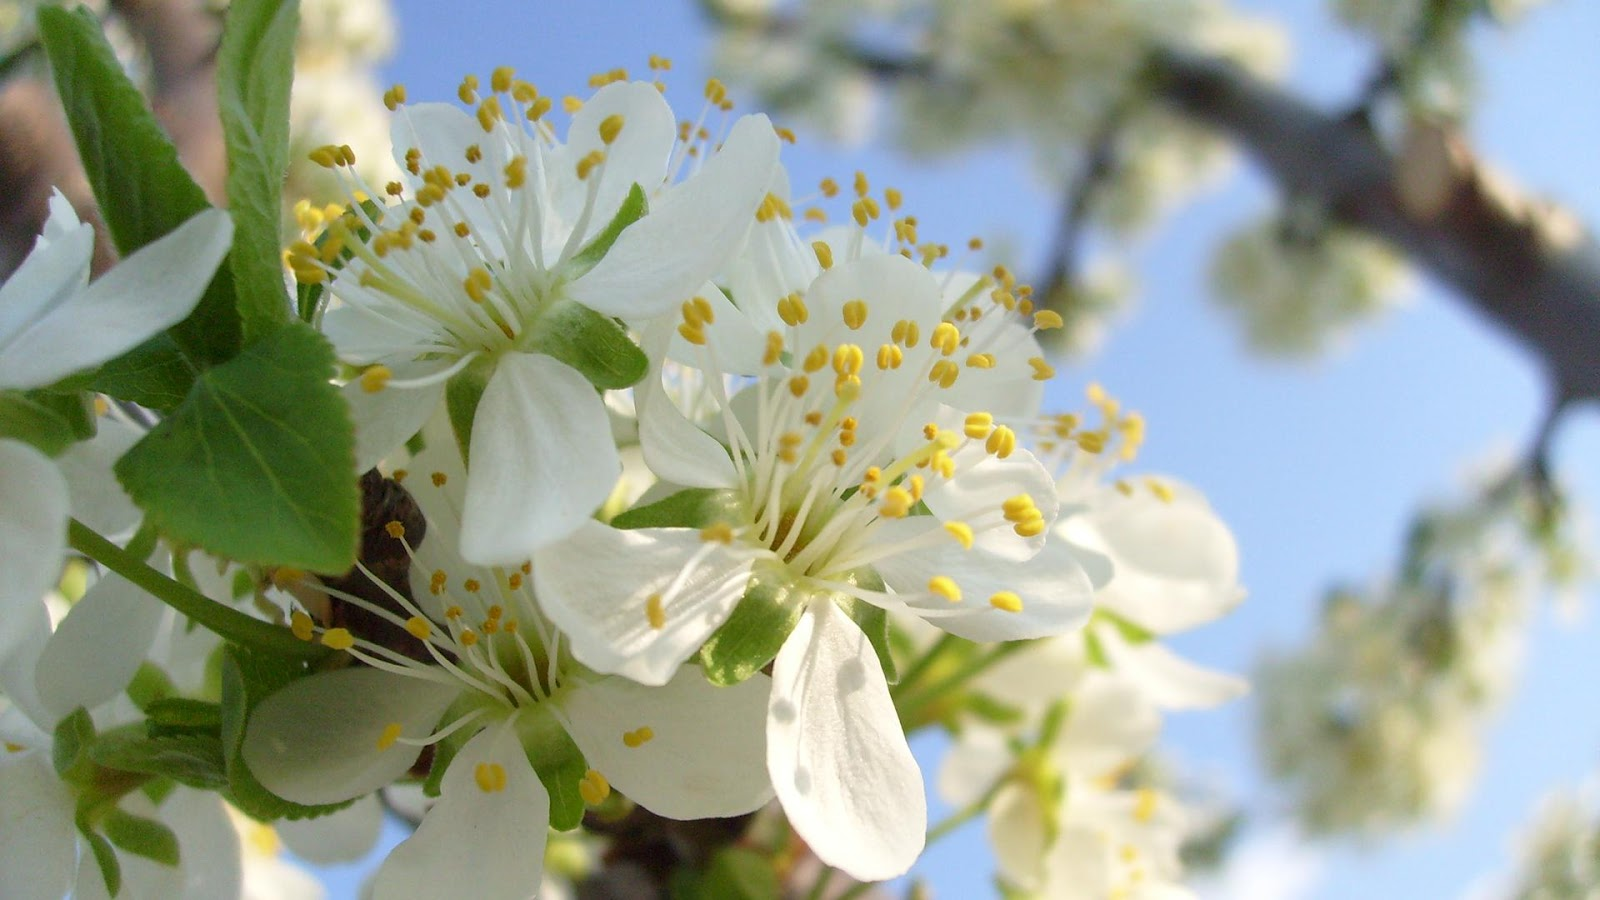 http://3.bp.blogspot.com/-Bl47kX0smd4/T9GV_tfODVI/AAAAAAAAD-k/pg-ICE-6bxk/s1600/Bloom+Flower+Wallpaper+4.jpg